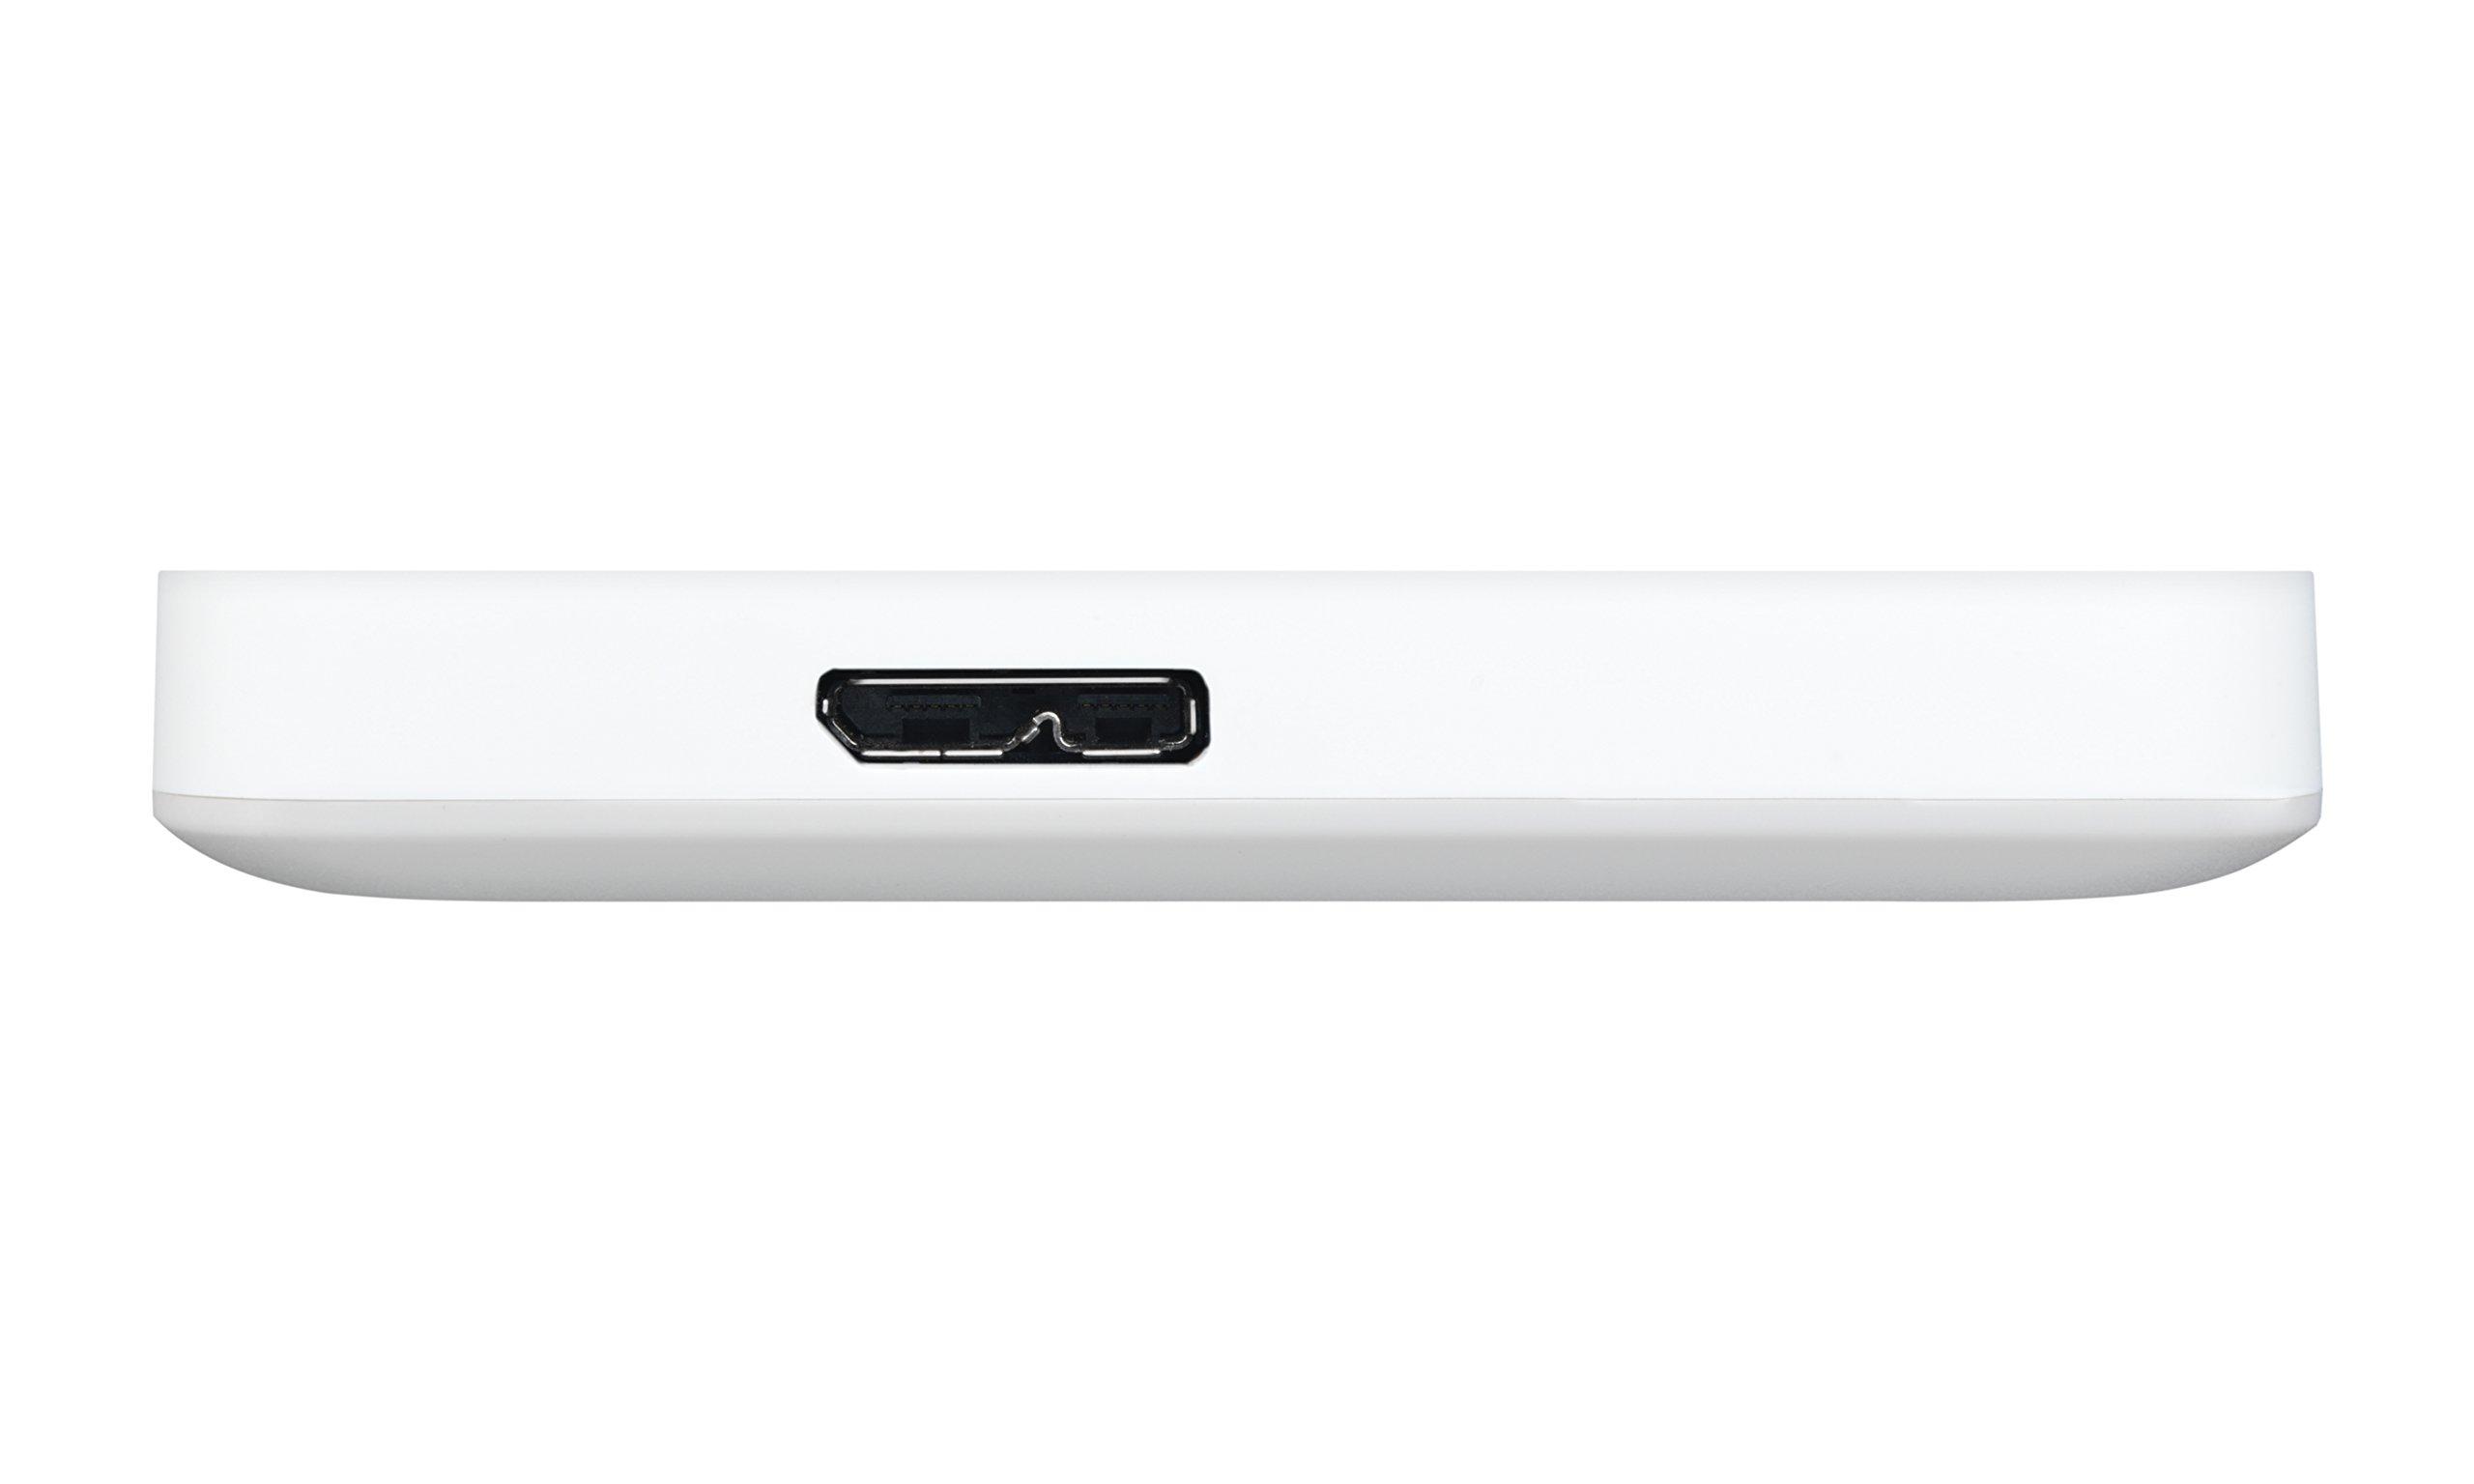 Toshiba Canvio Advance 1TB Portable External Hard Drive USB 3.0, White (HDTC910XW3AA) by Toshiba (Image #5)